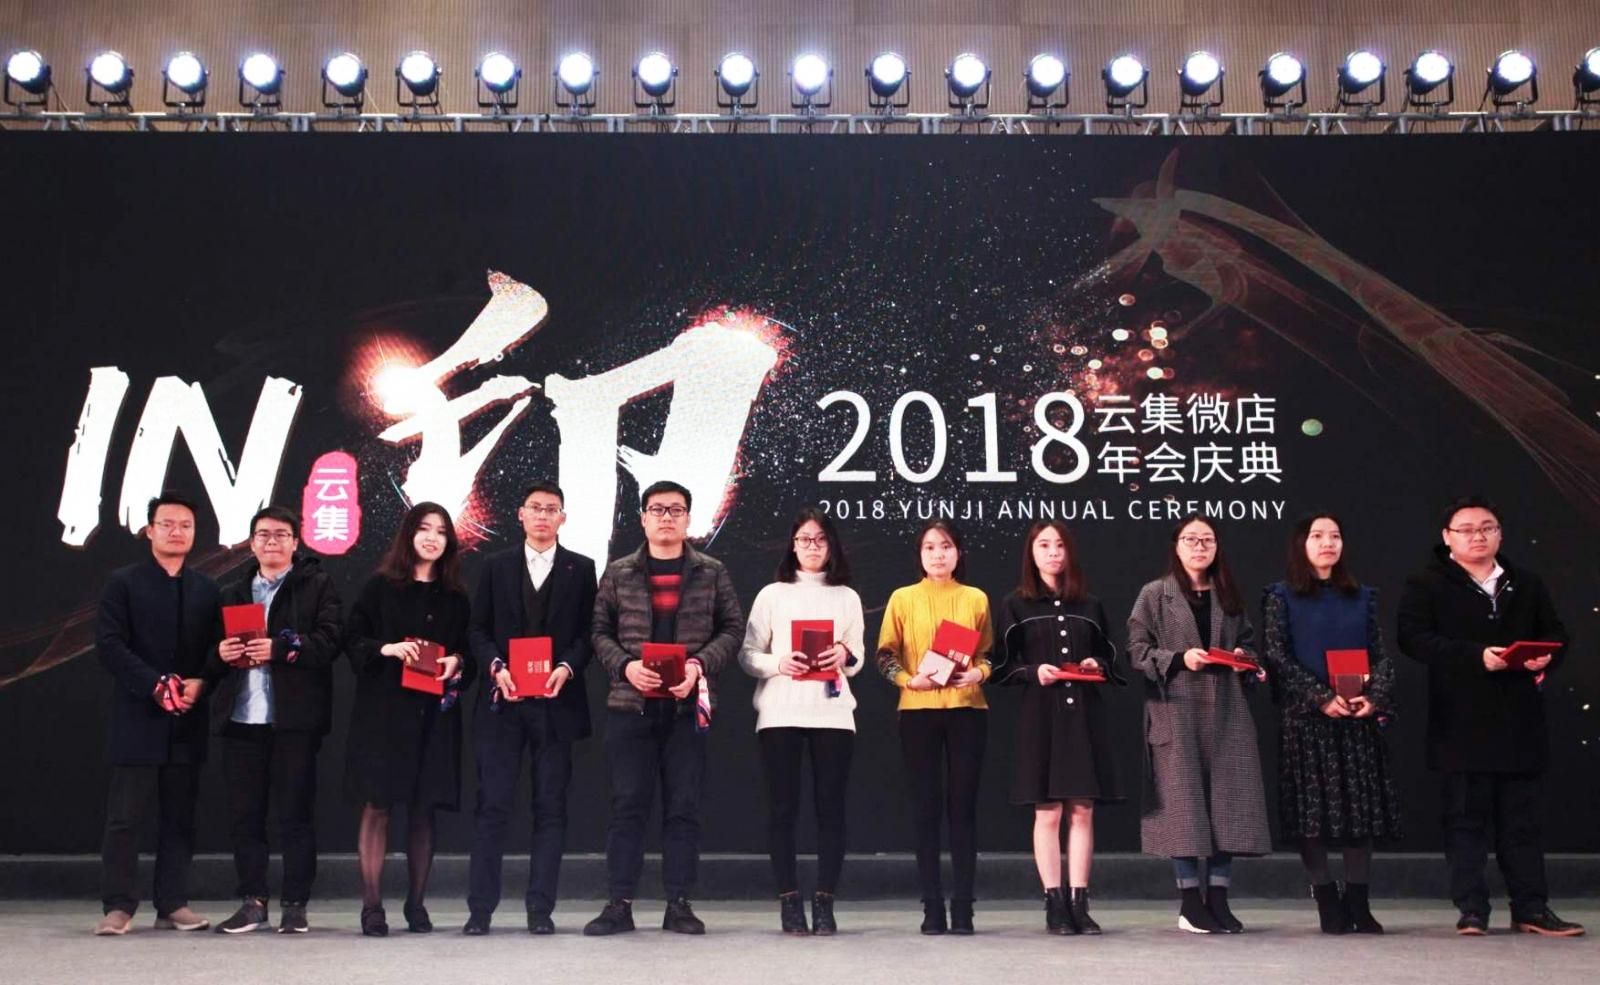 """IN印云集""2018云集微店年会庆典-15"